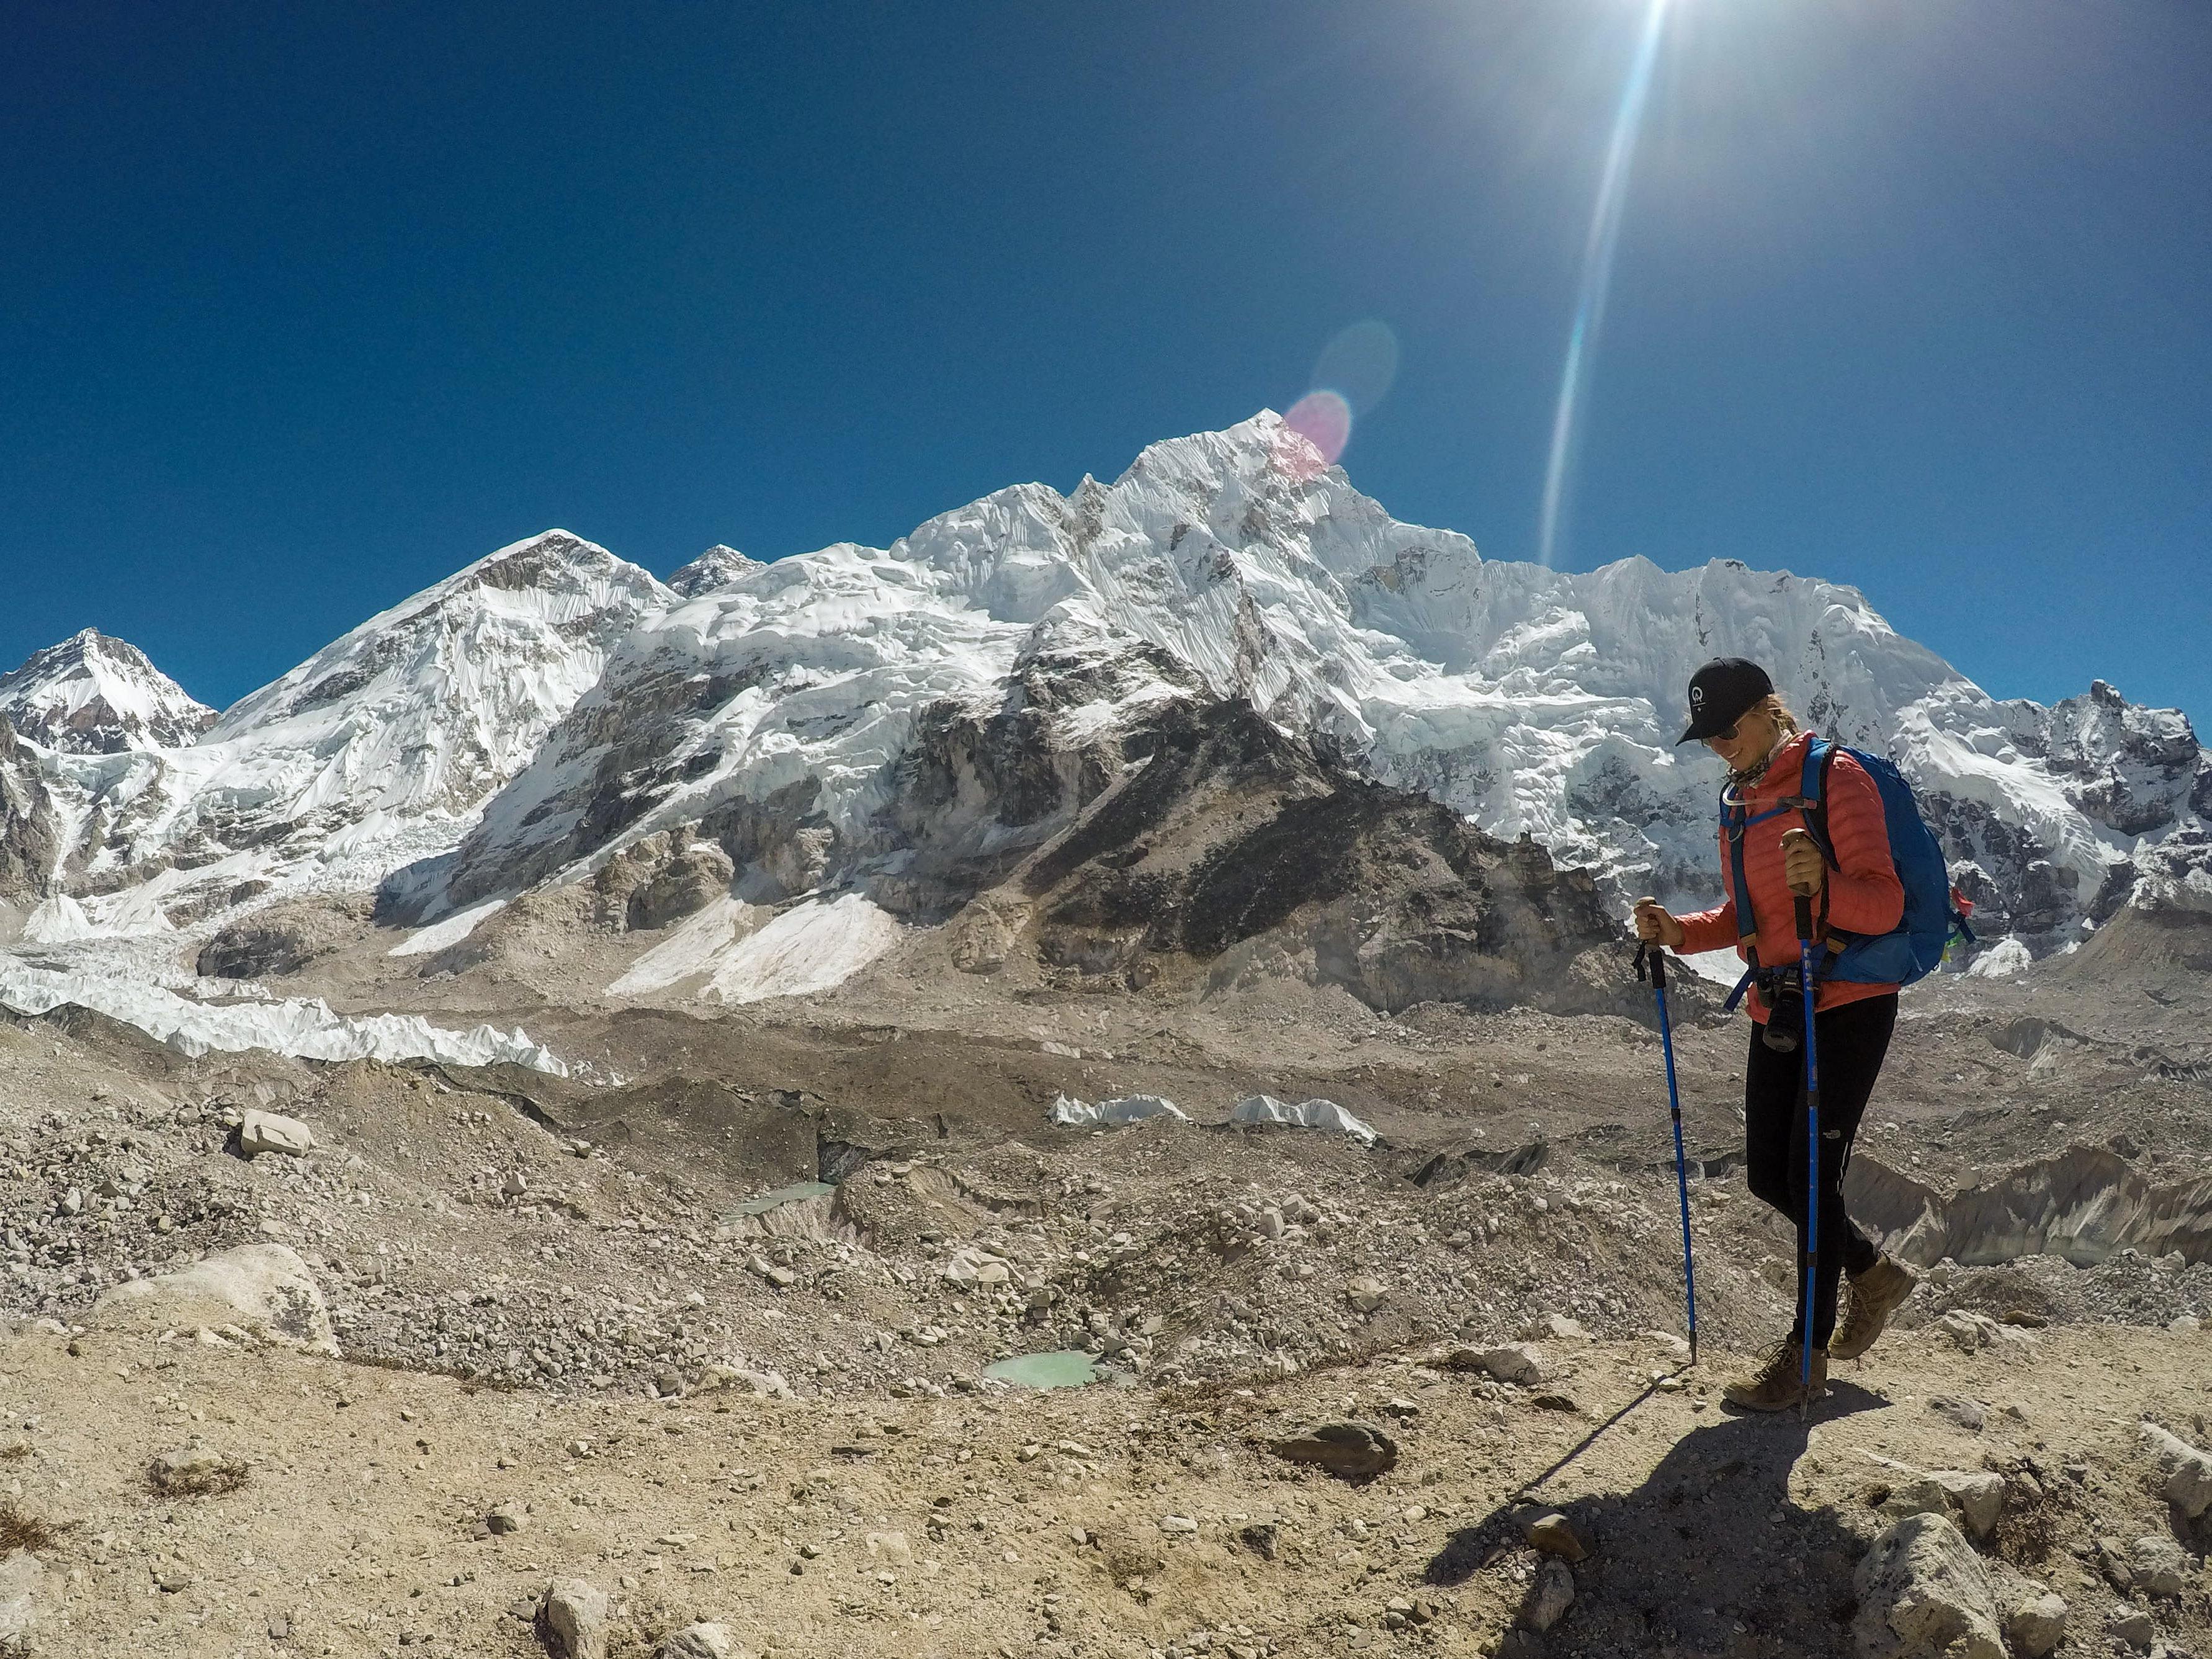 Everest basecamp trek photos - Mount Everest showing in the distance